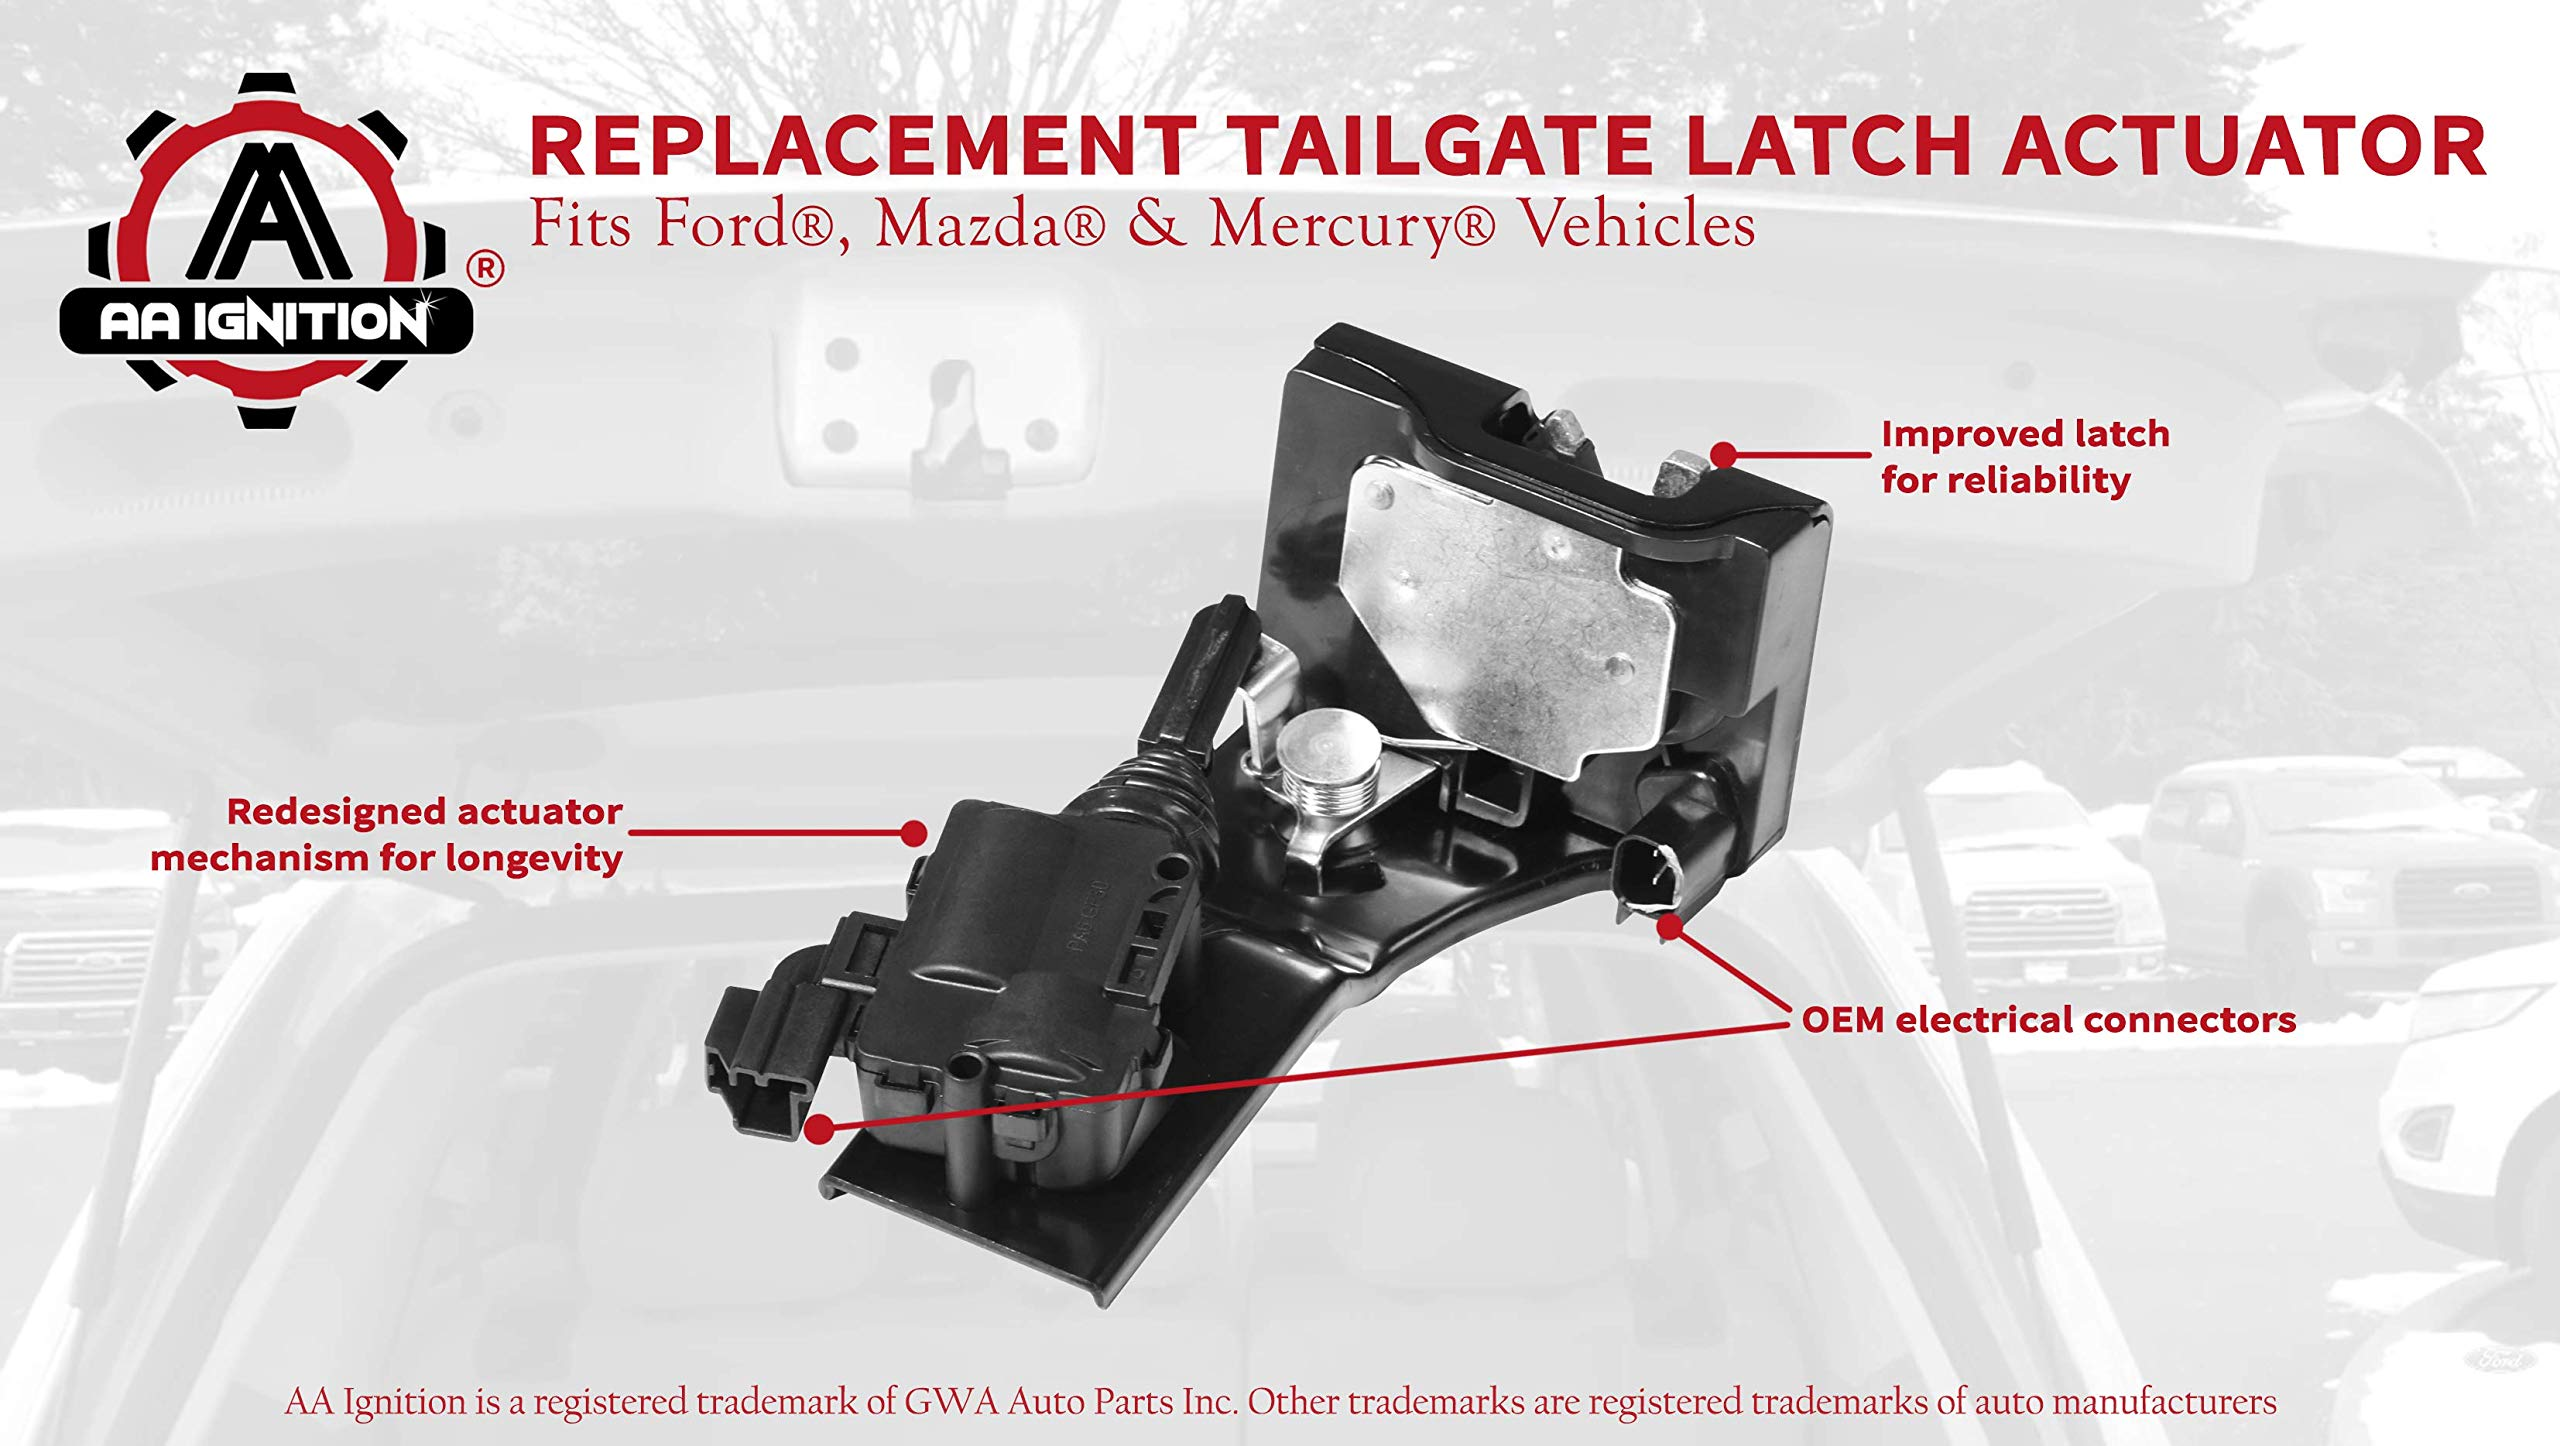 FEXON Liftgate Actuator Rear Hatch Trunk Door Latch Tailgate Lock Motor for 2009 2010 2011 2012 Ford Escape 2009-2011 Mercury Mariner 2008-2011 Mazda Tribute Replaces 937-663 9L8Z-7843150-B